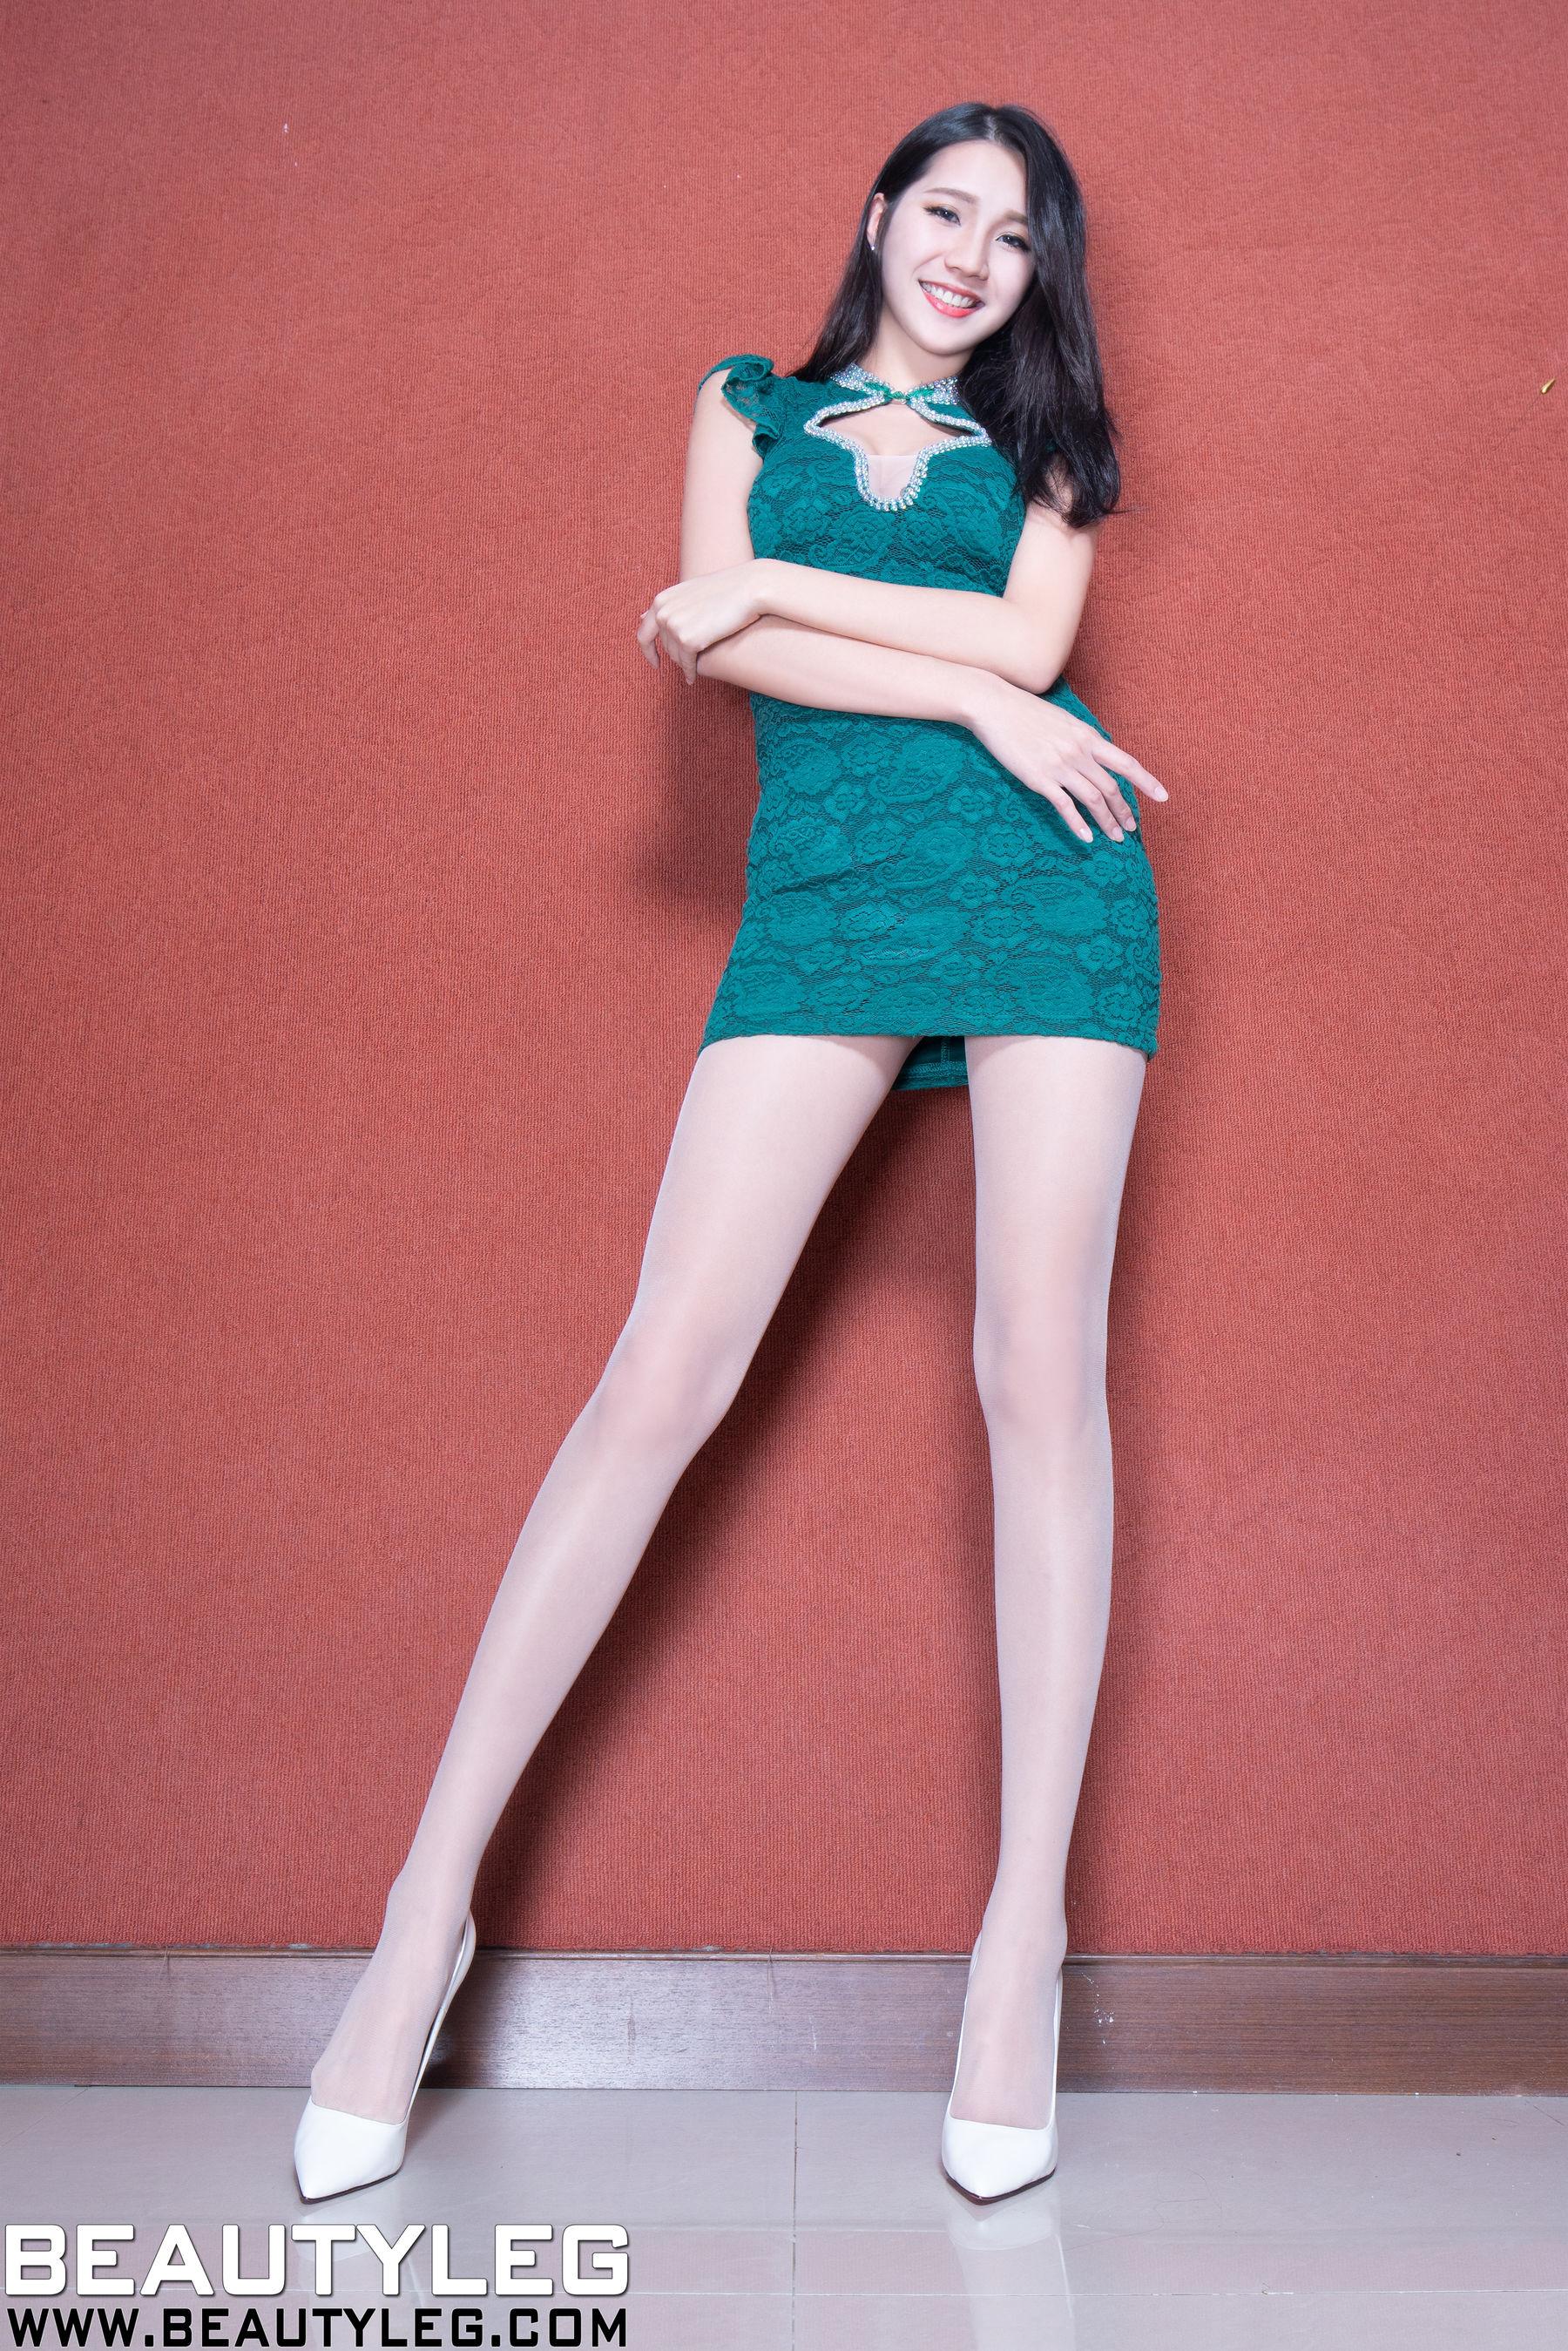 VOL.1116 [Beautyleg]制服丝袜美腿高跟:林千如(腿模Anita)超高清个人性感漂亮大图(50P)